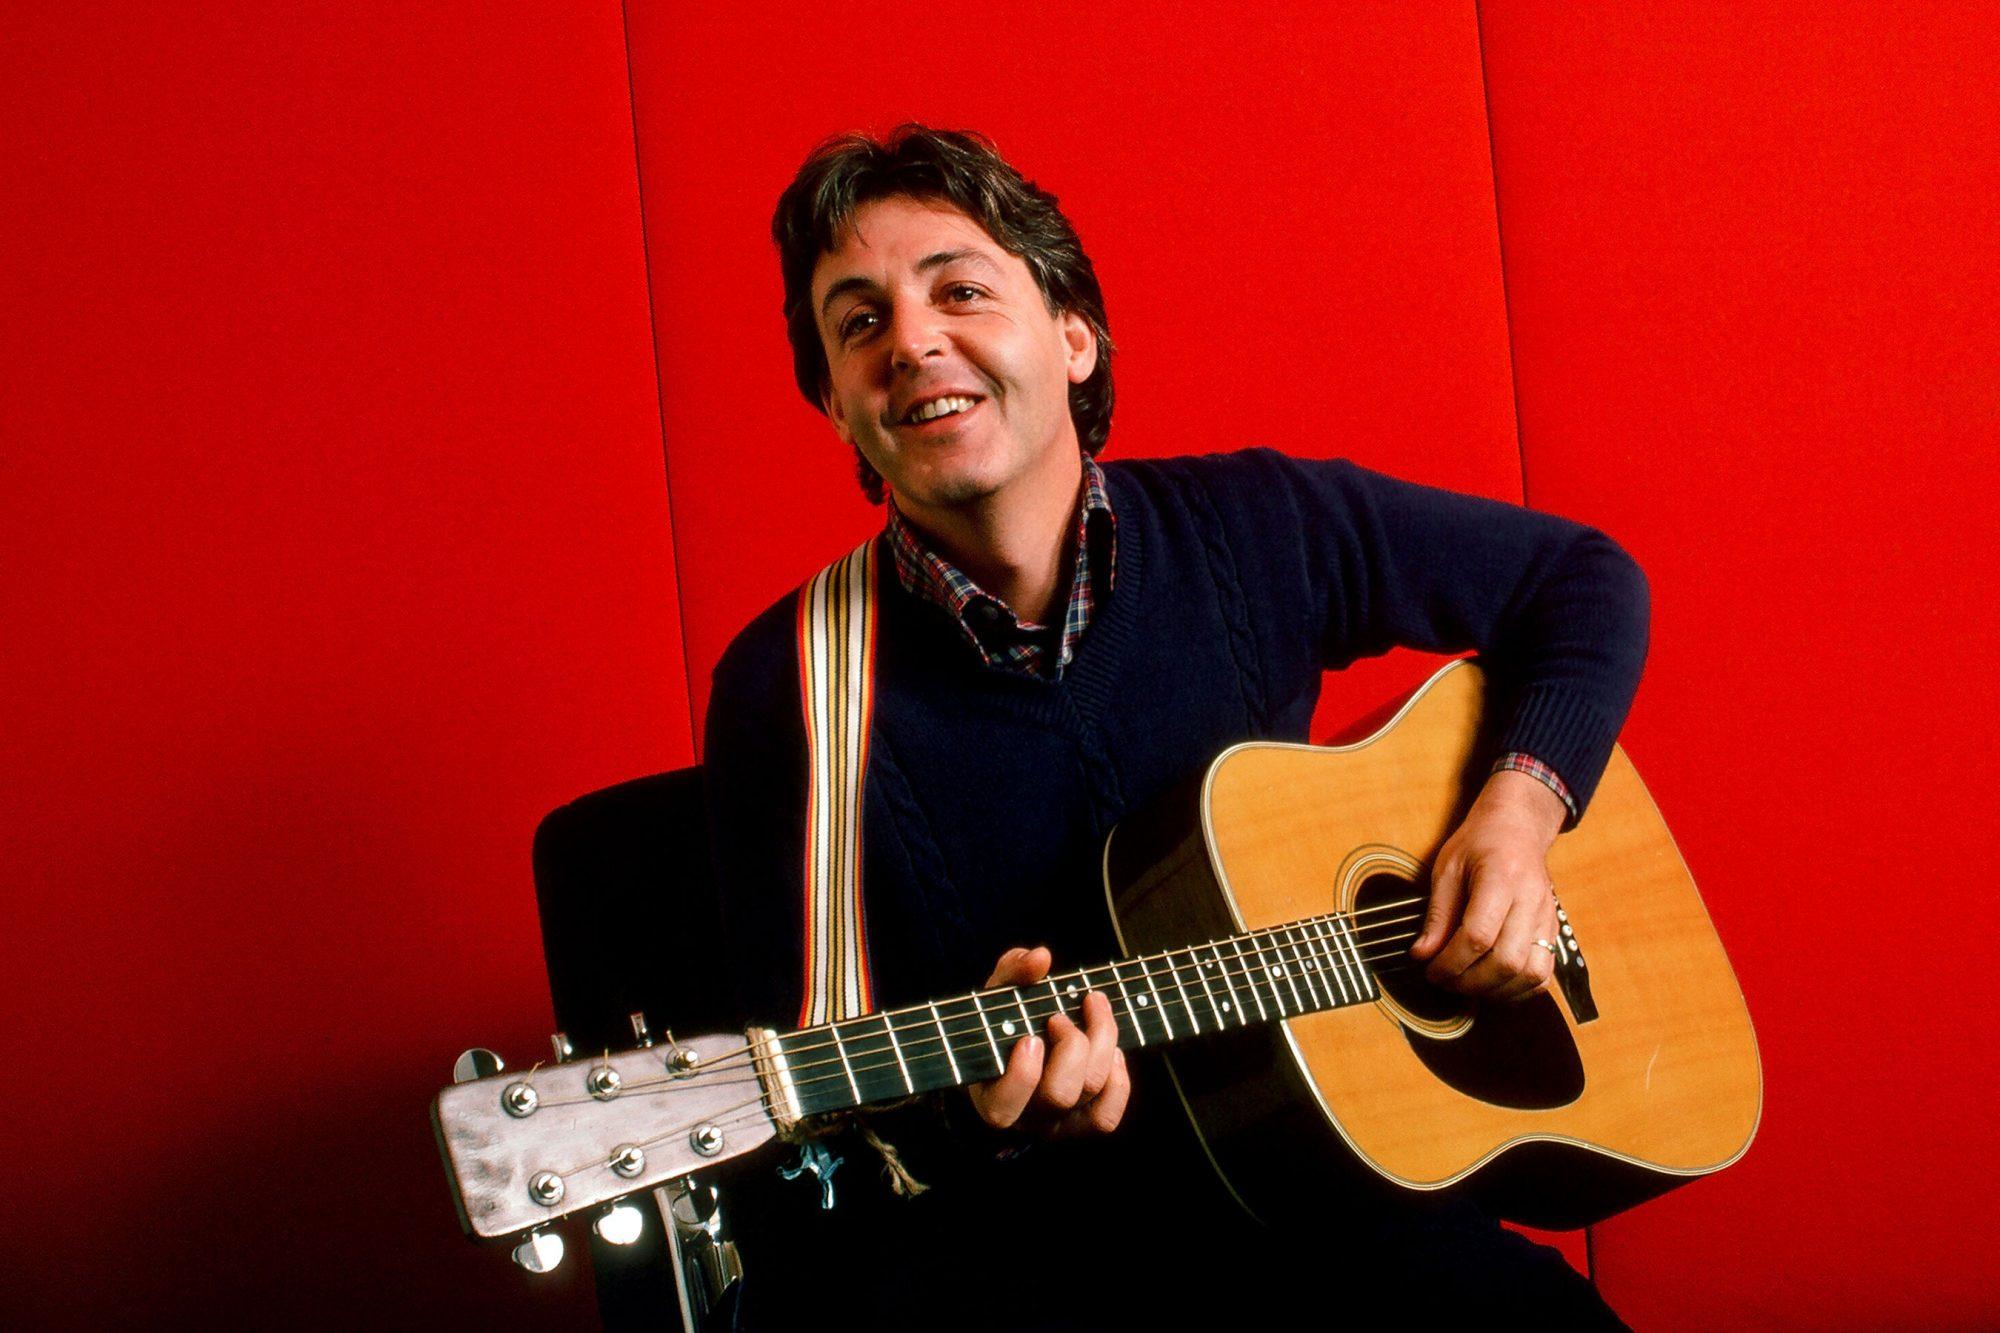 Paul McCartney With Guitar